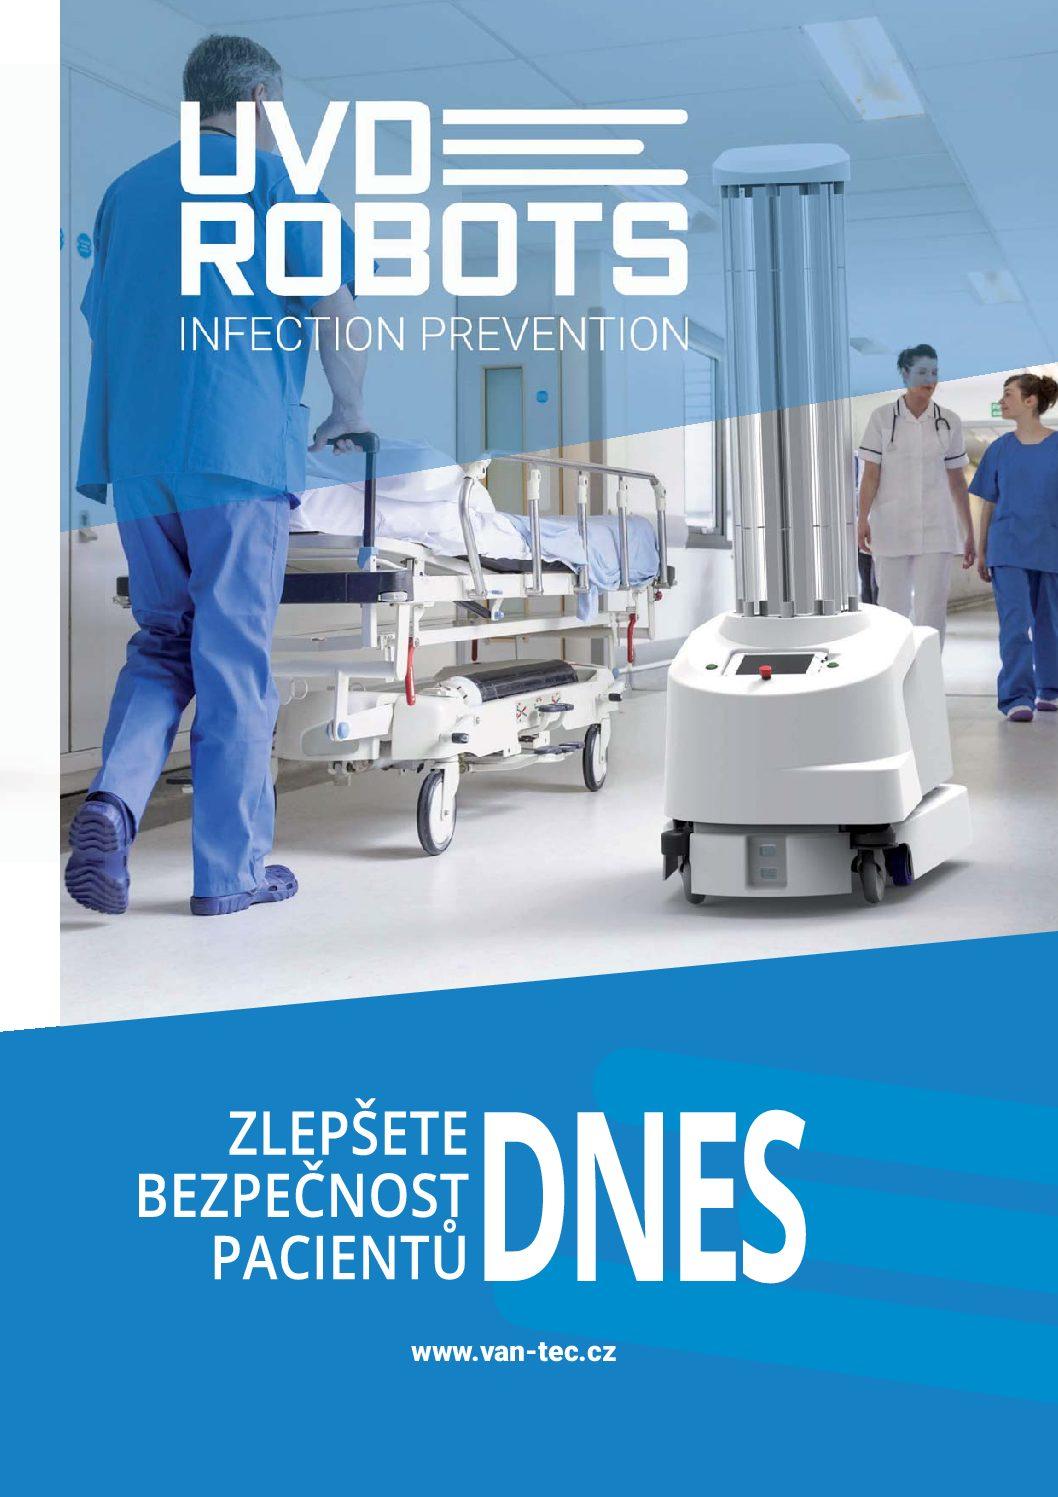 UVD robots-2